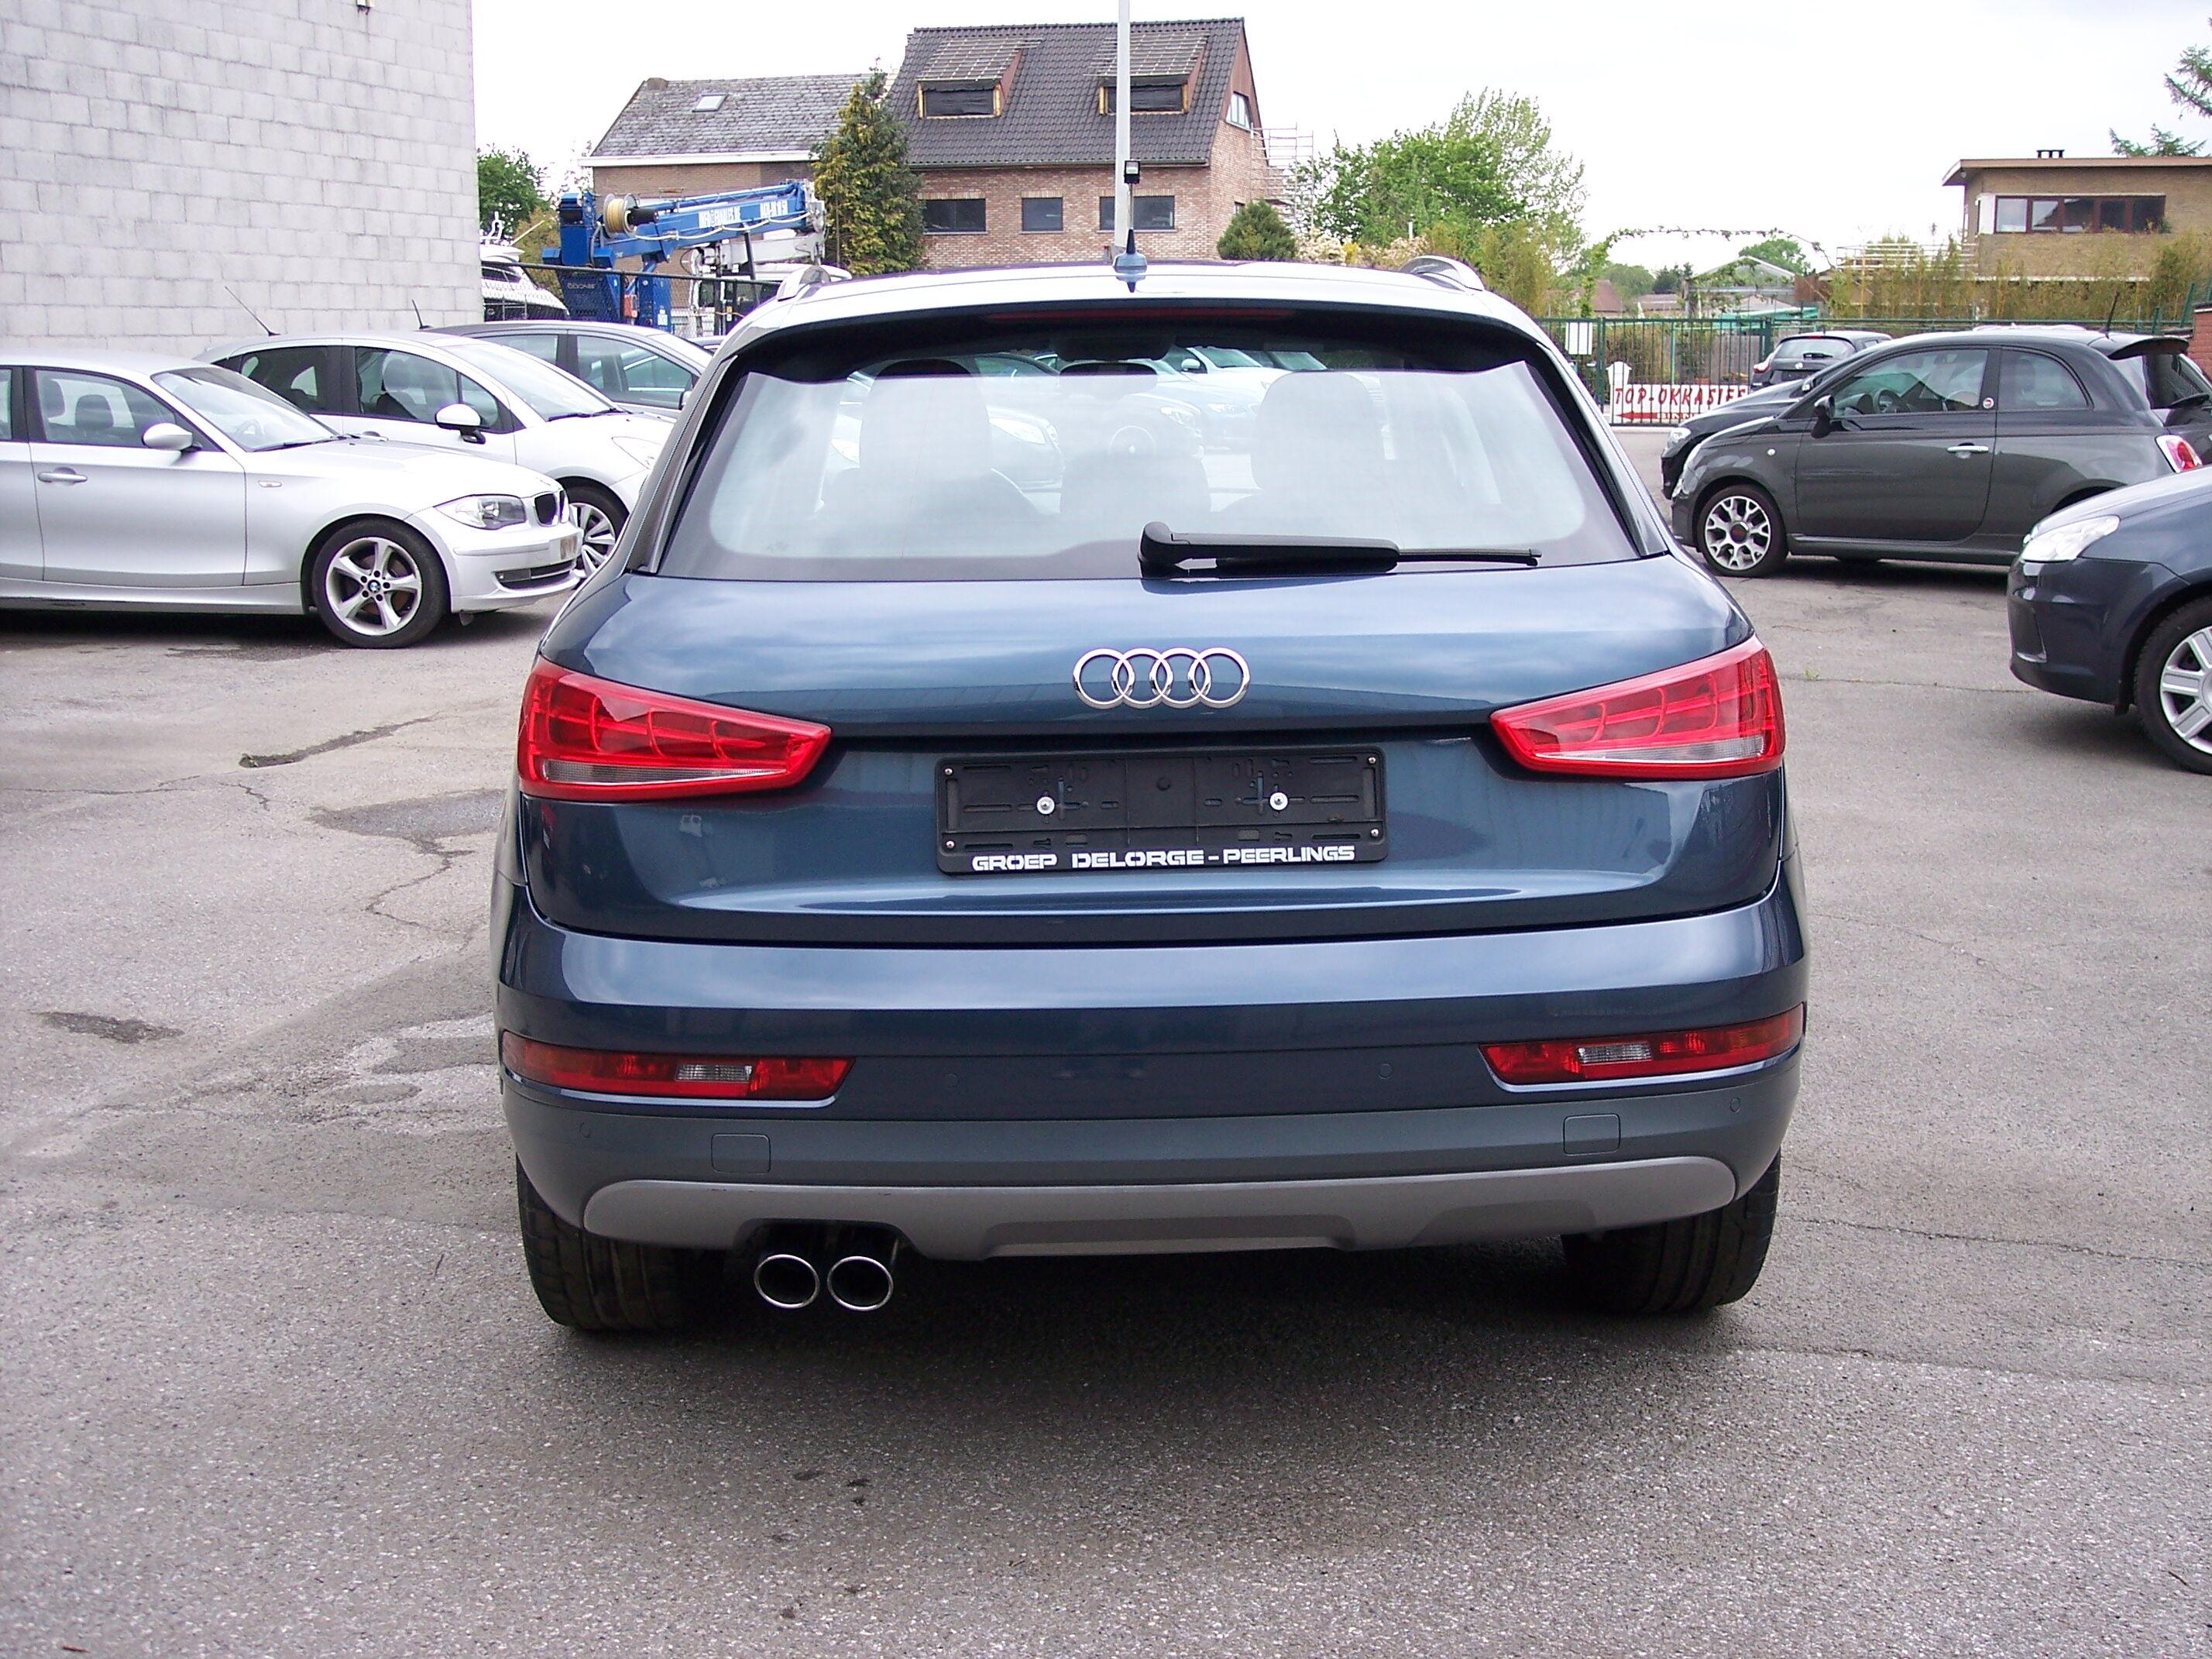 Audi Q3 - 2015 SUV AUTOMAAT 6/13